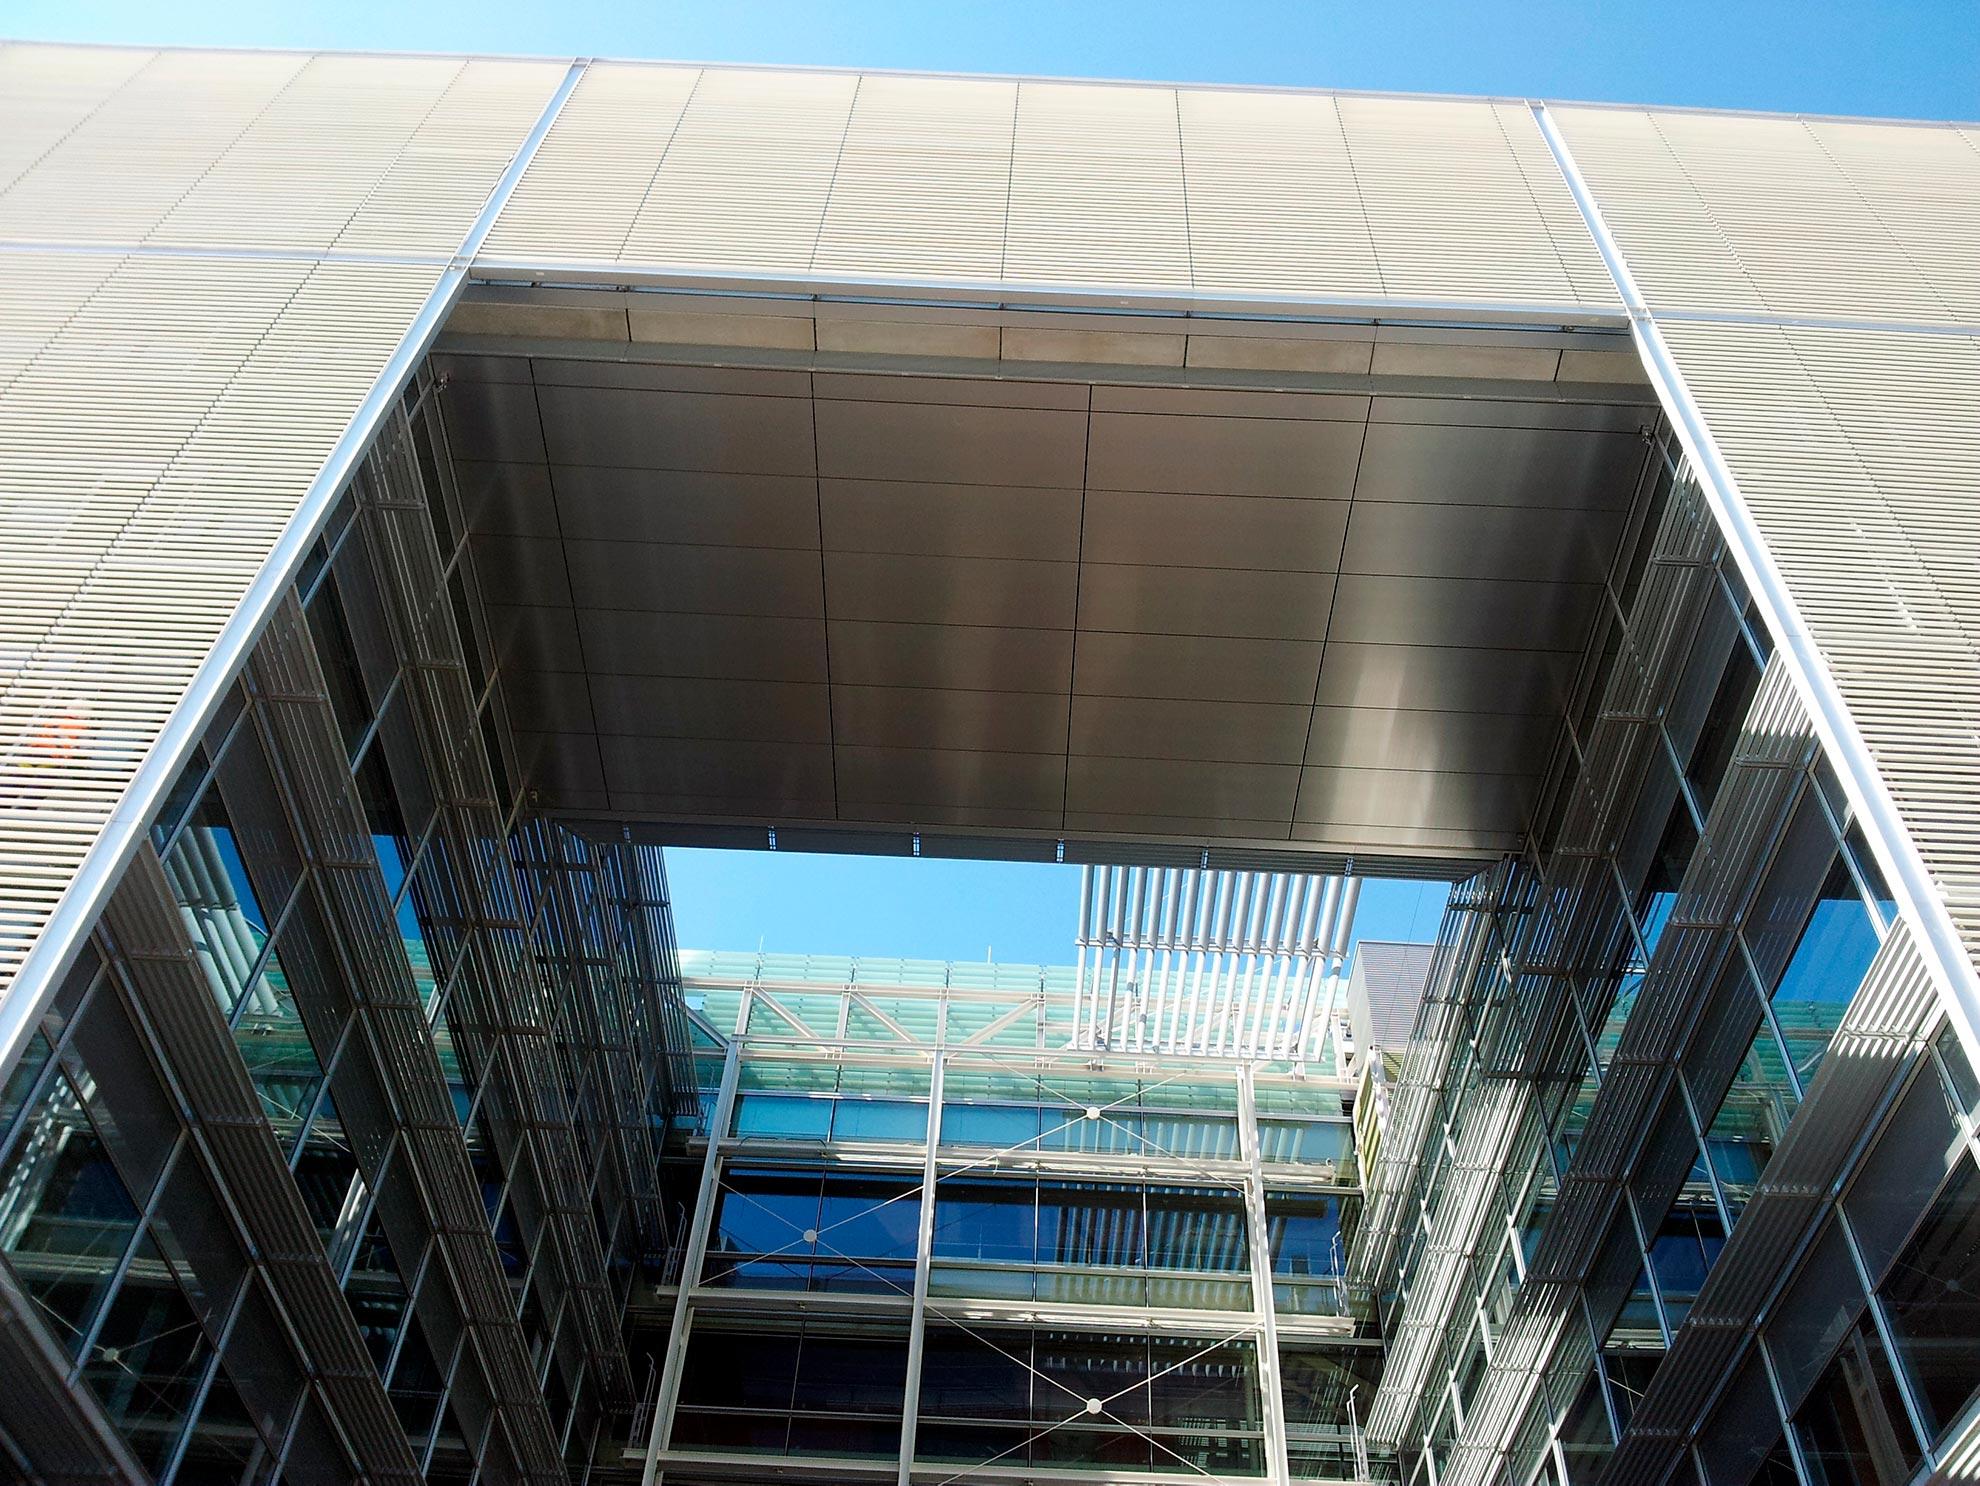 Edificio-Banco-Popular.-Madrid-Espaa.-larcore-A2-Anodic-Brushed-01-2_1592409233.jpg